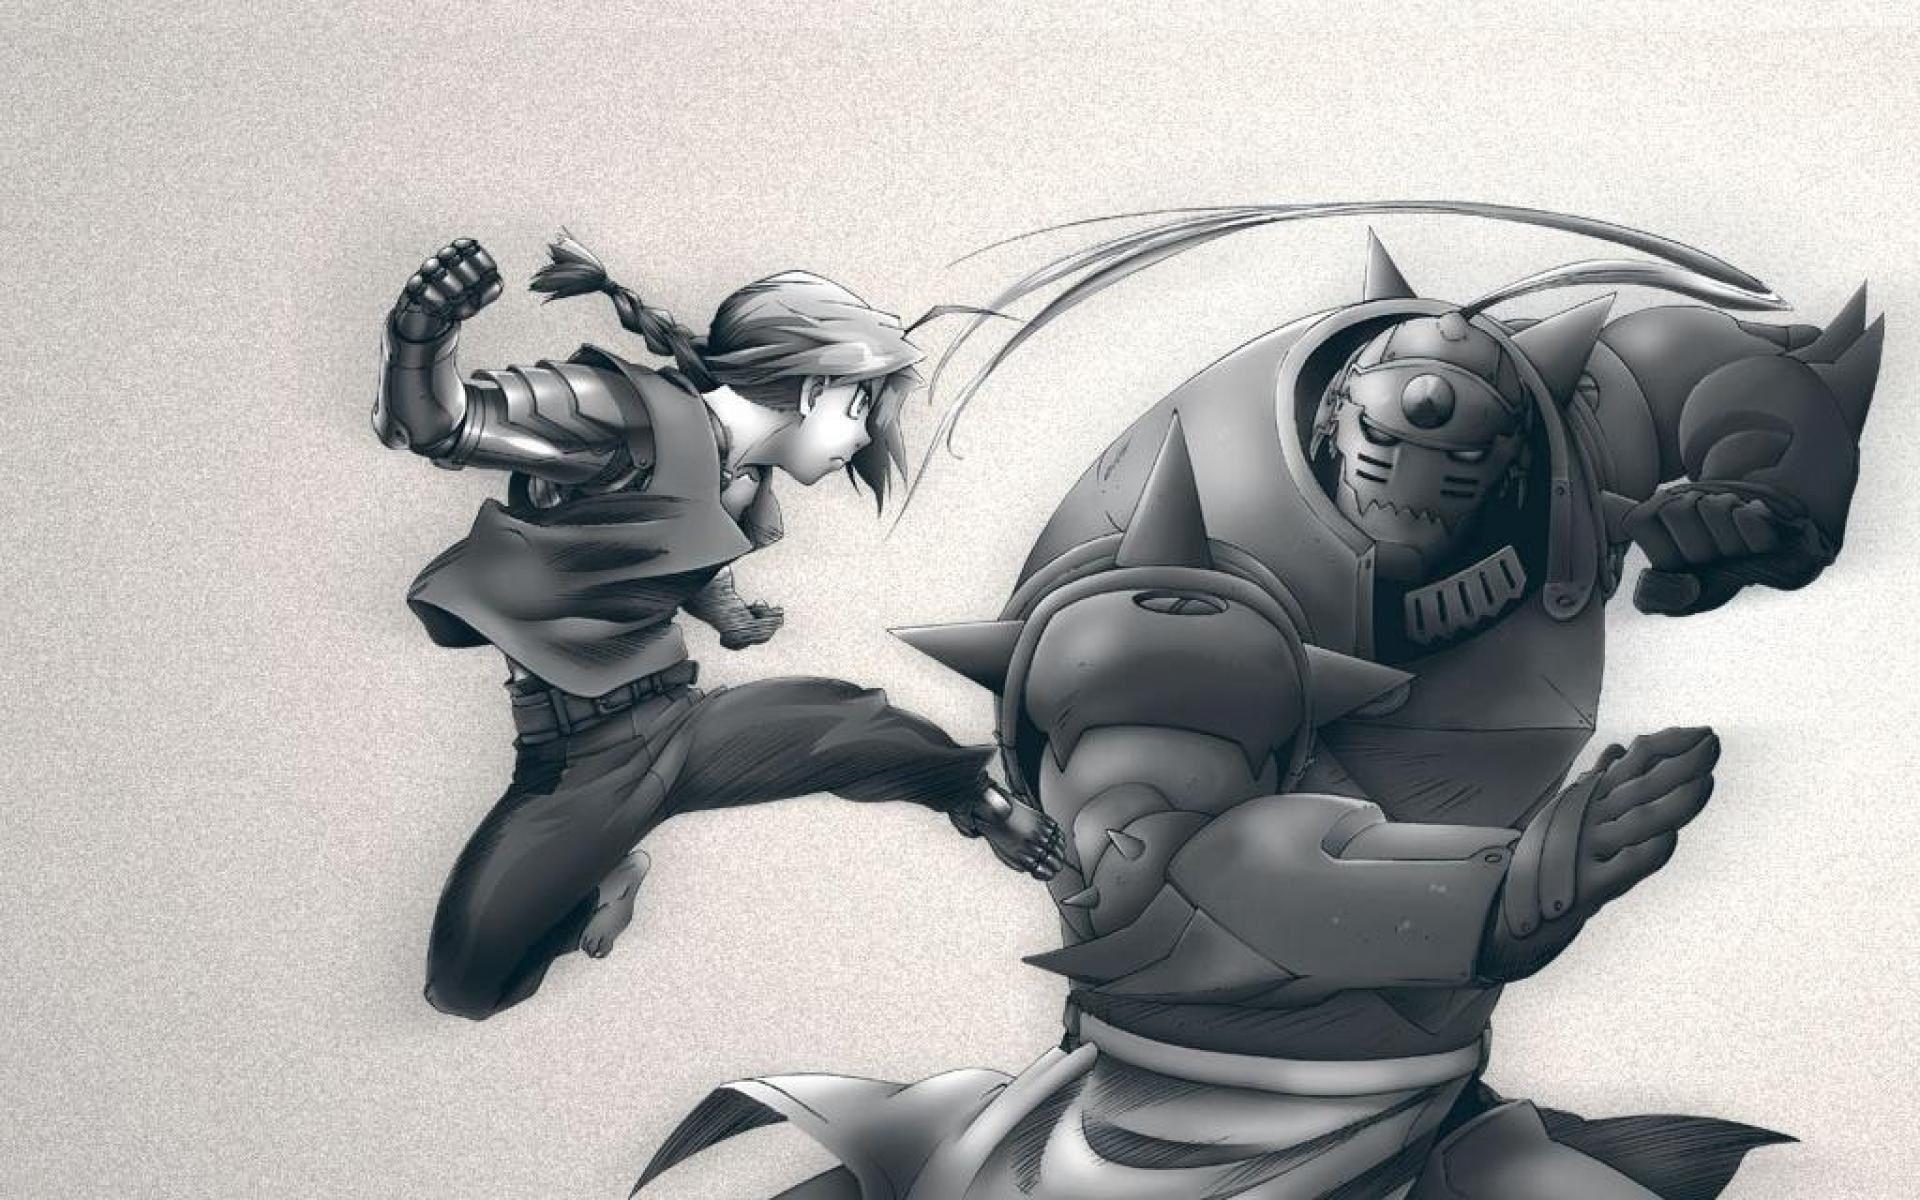 fullmetal alchemist brotherhood wallpaper 1080p | sharovarka